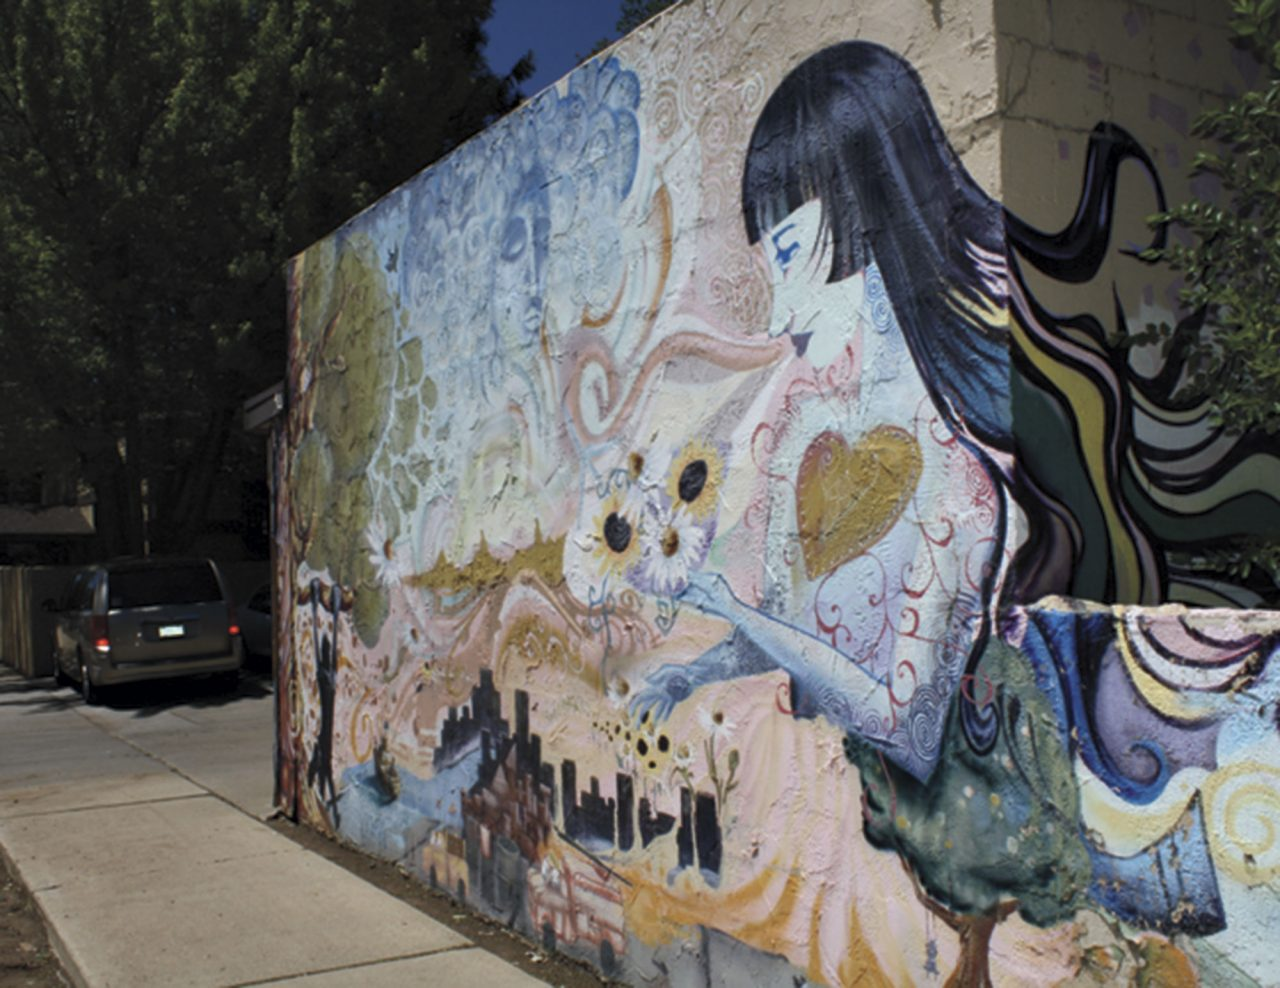 LeRoux Street Mural